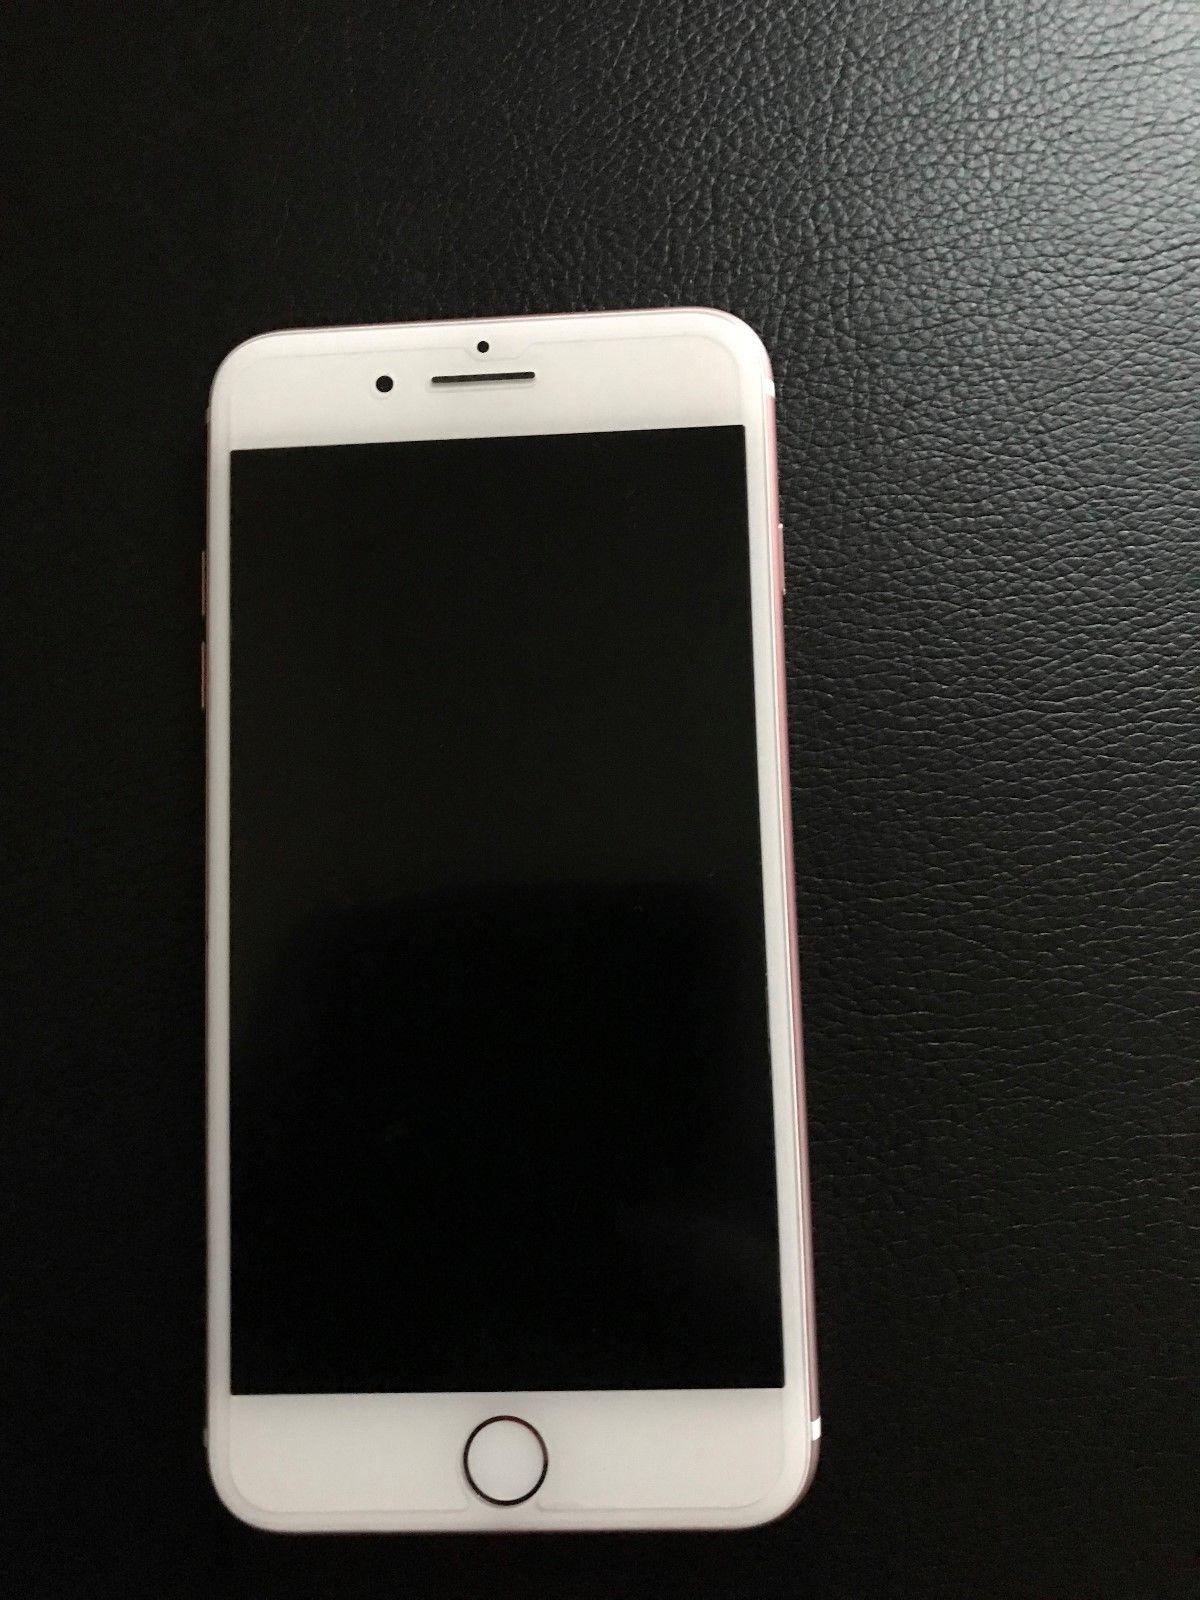 Apple Iphone 7 Plus 32gb Rose Gold Unlocked A1661 Cdma Gsm